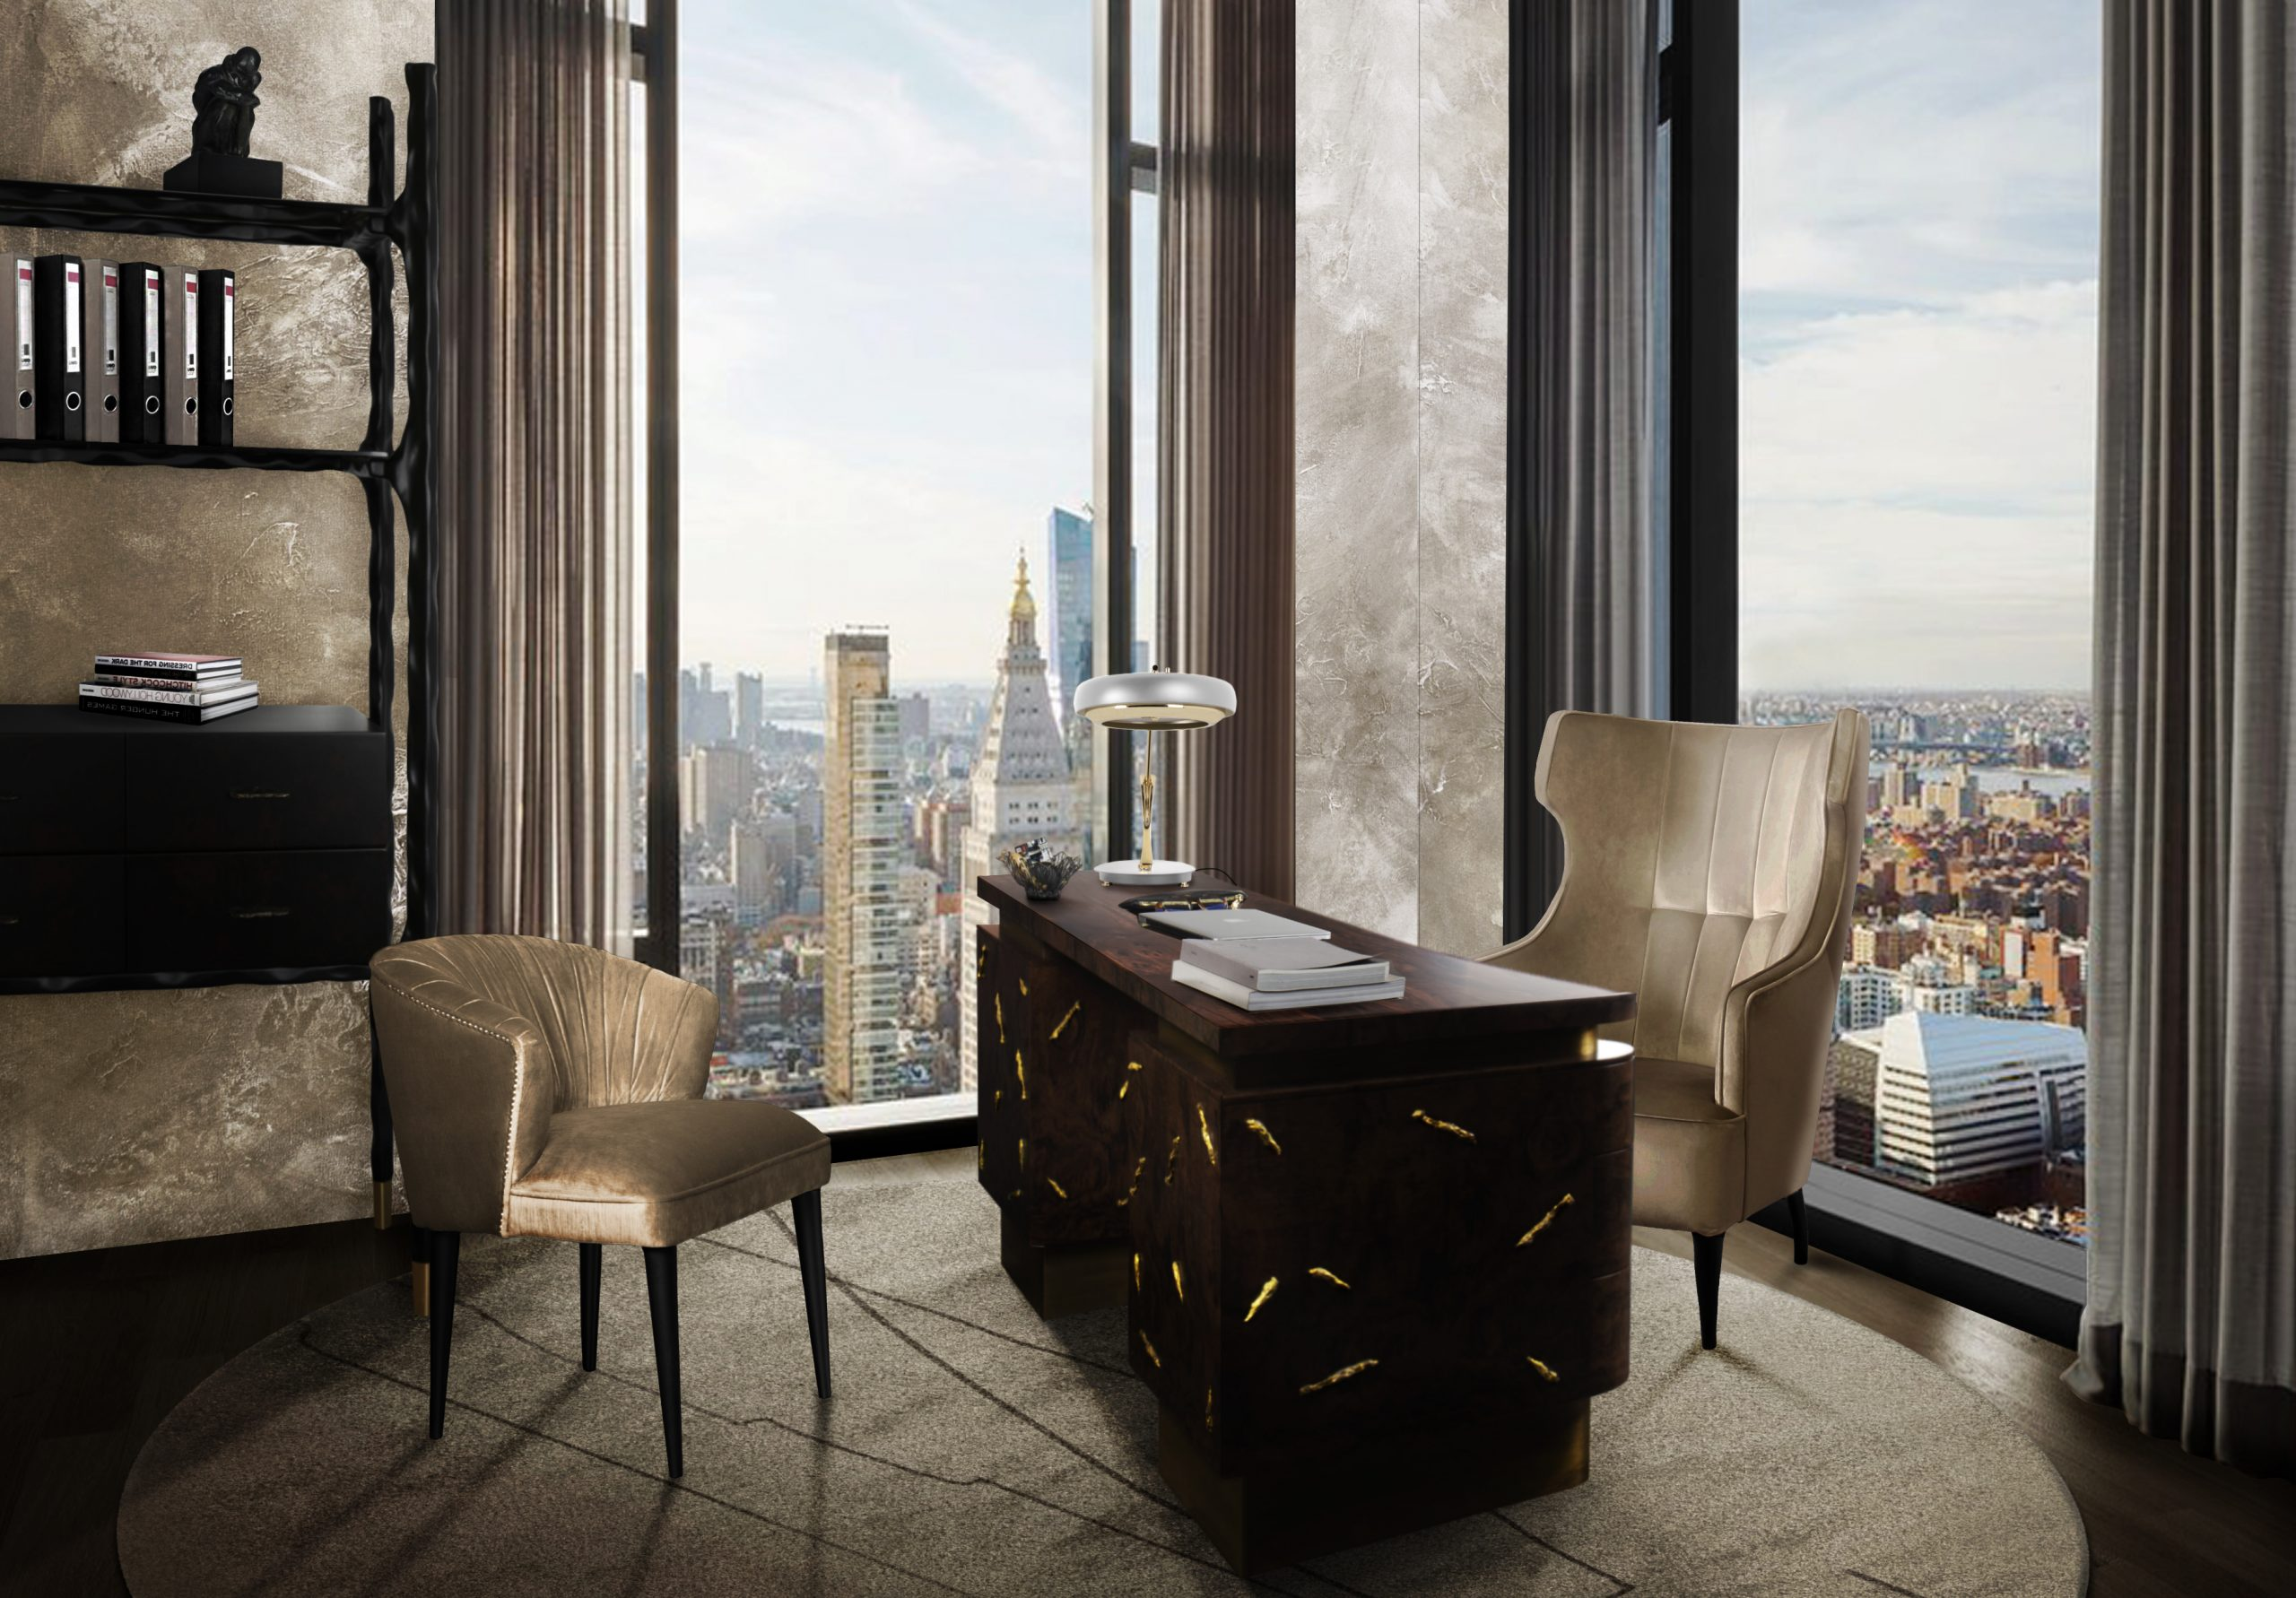 2021 Interior Design Trends  2021 interior design trends 2021 Interior Design Trends BB baraka desk ibis armchair scaled